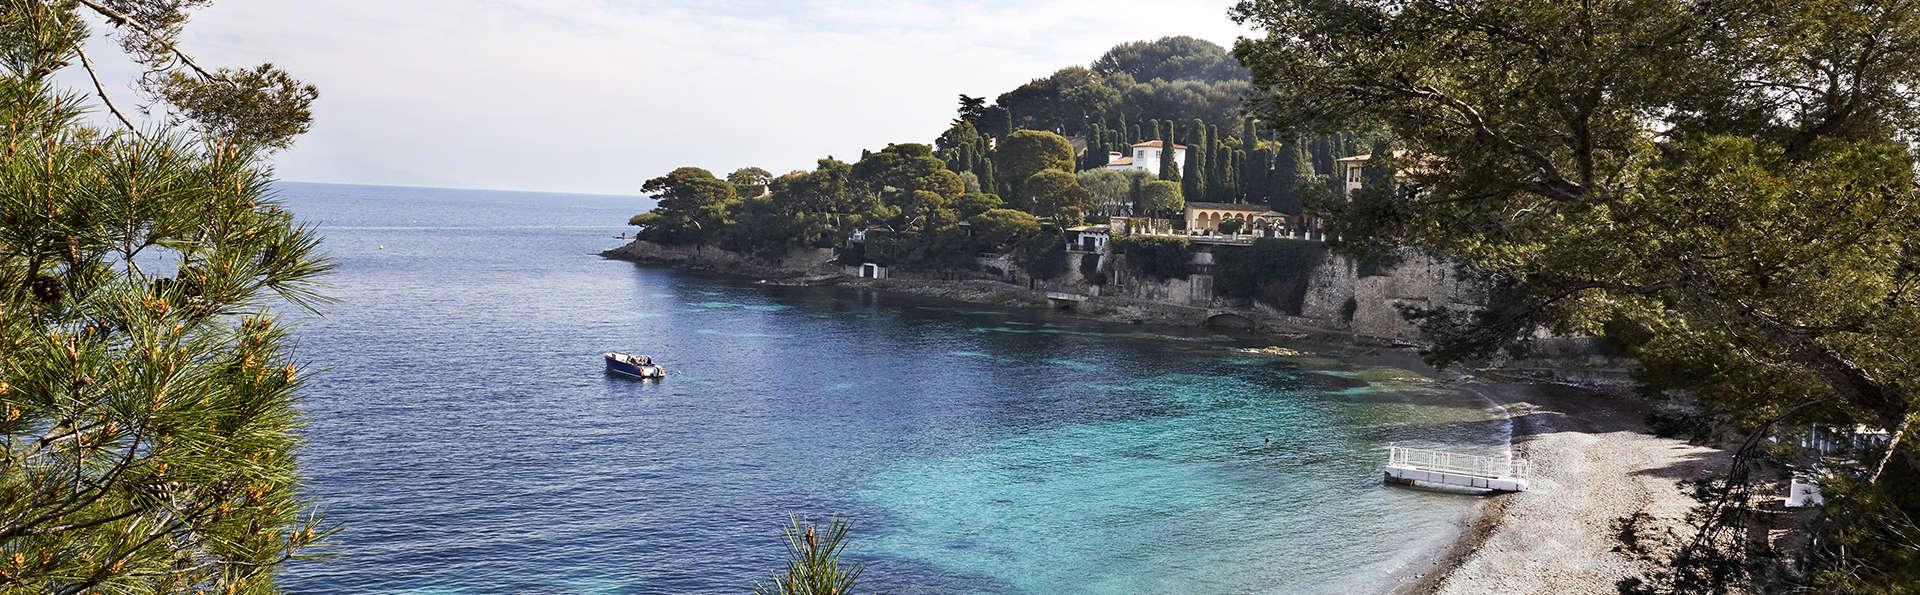 Hôtel Riviera Marriott La Porte de Monaco - EDIT_St_Jean_Cap_Ferrat_Paloma_Beach.jpg